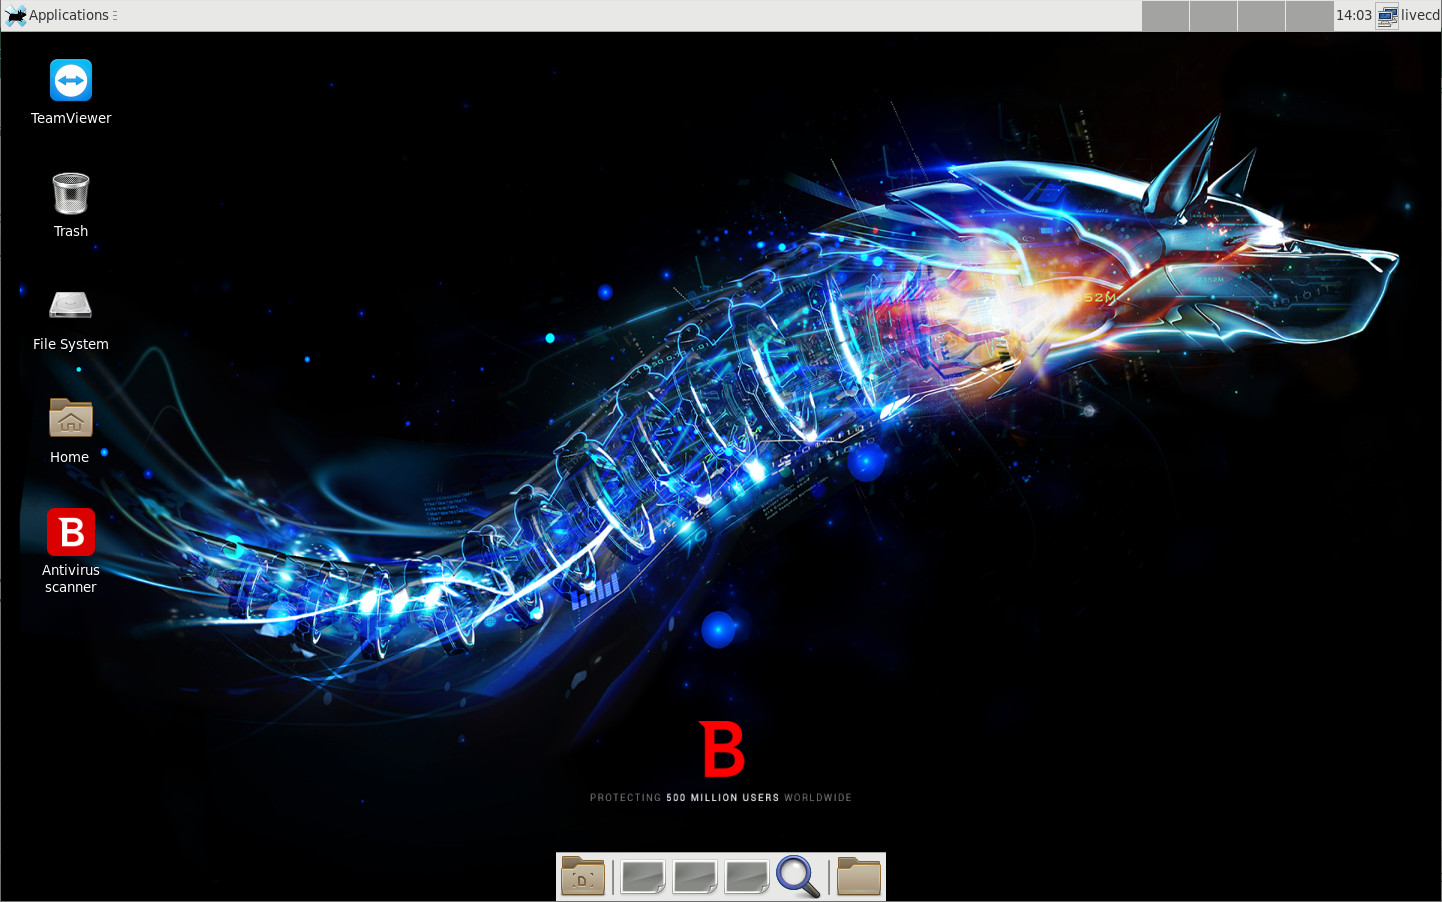 Screenshot 1 - Bitdefender Rescue CD